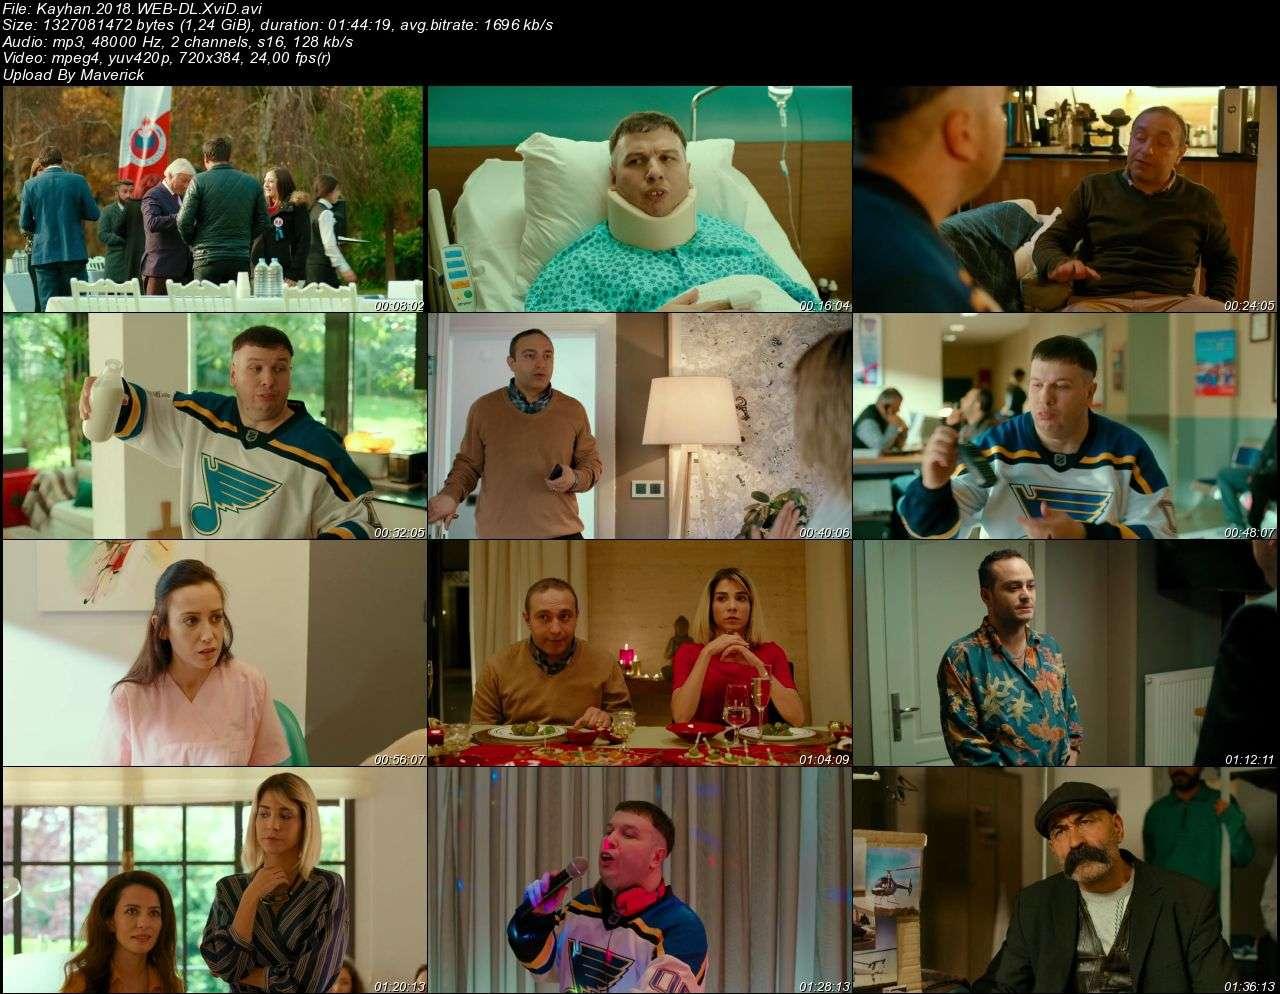 Kayhan - 2018 (Yerli Film) WEB-DL XviD indir